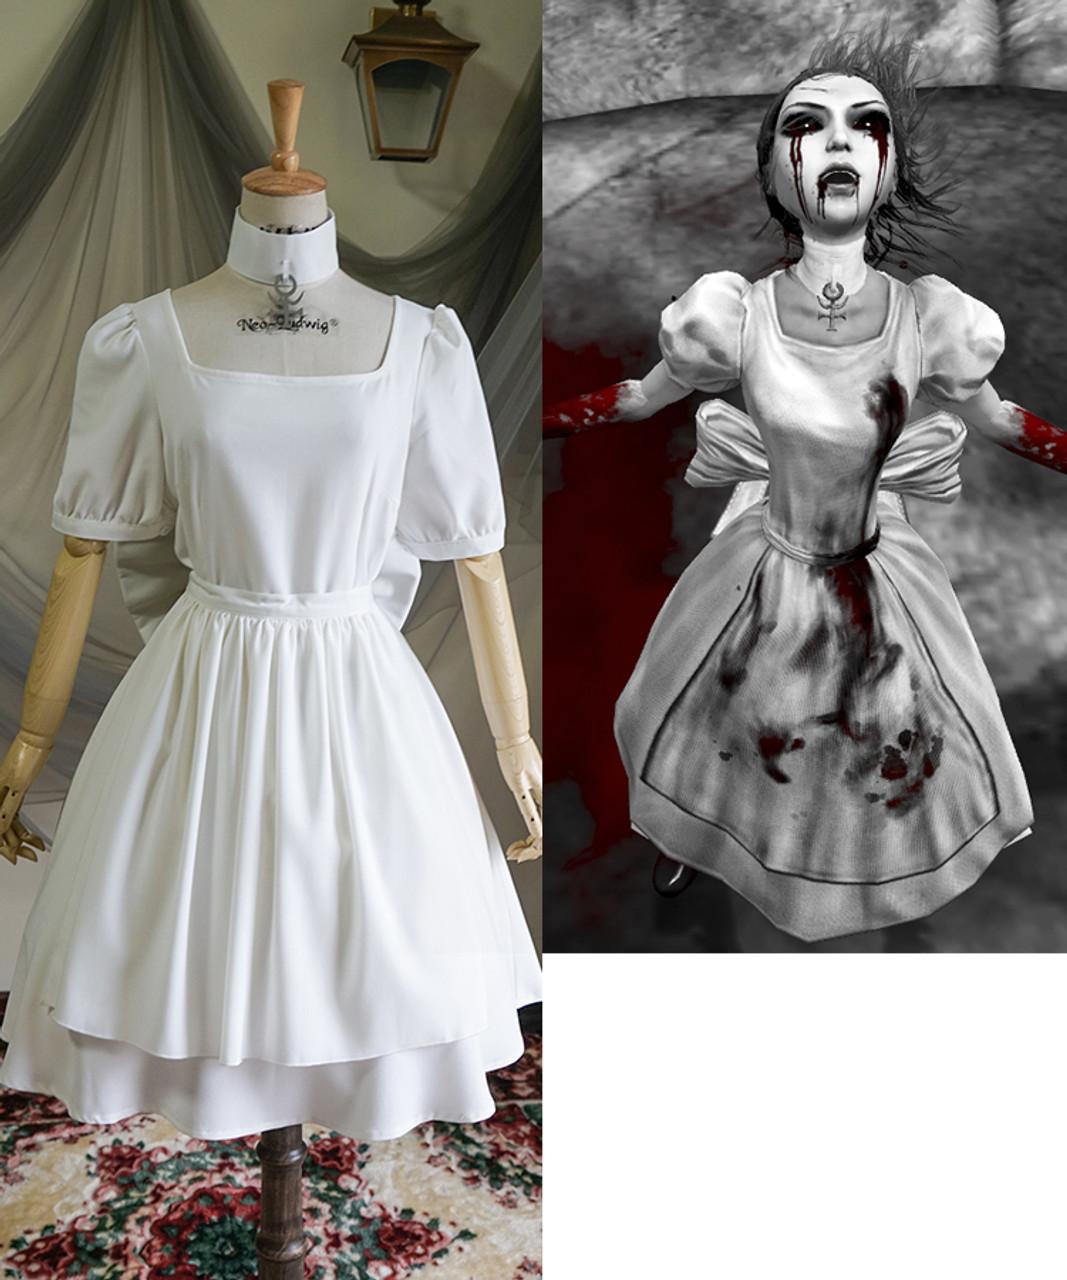 alice  madness returns  game  cosplay  hysteria maid dress  u0026 apron costume set